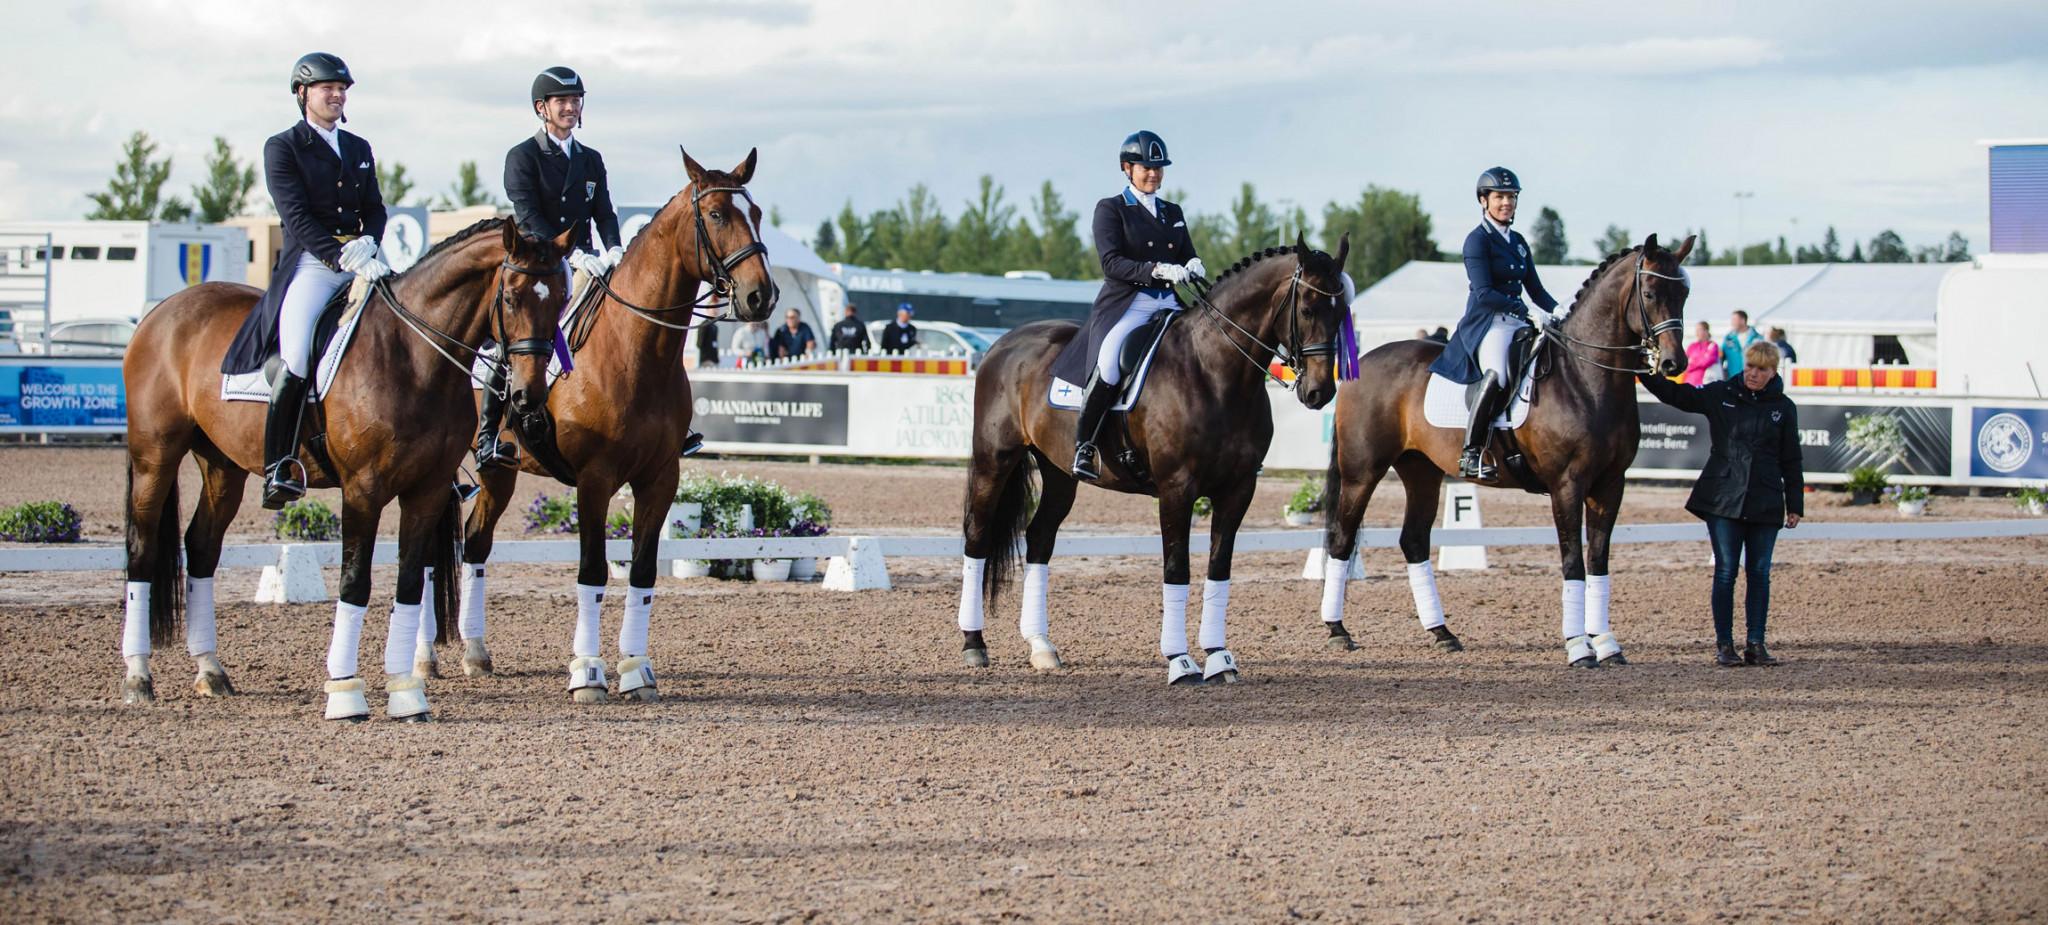 Sweden edge Finland as FEI Dressage Nations Cup season continues in Järvenpää